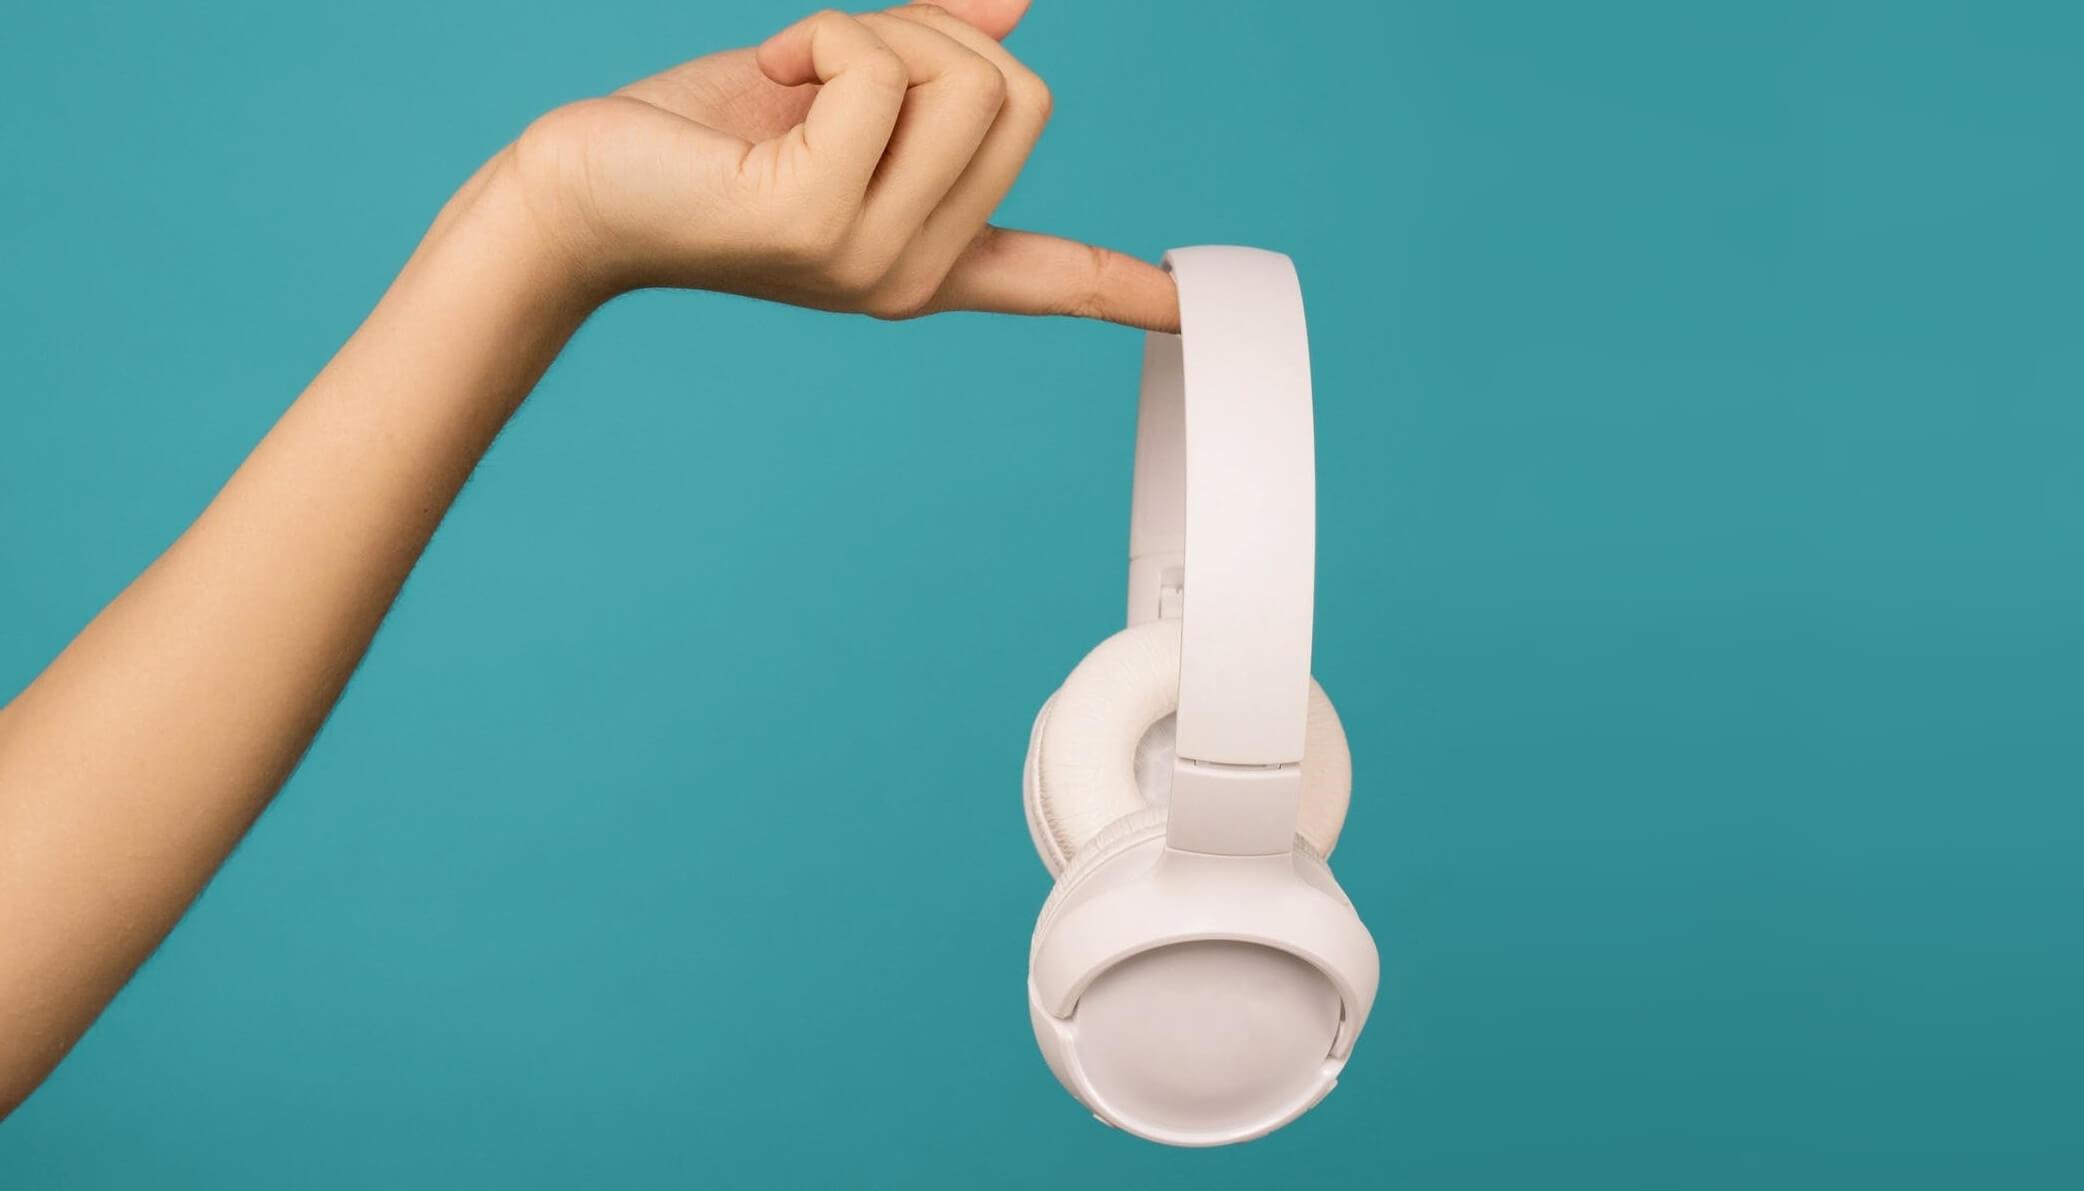 Best Android Headphones